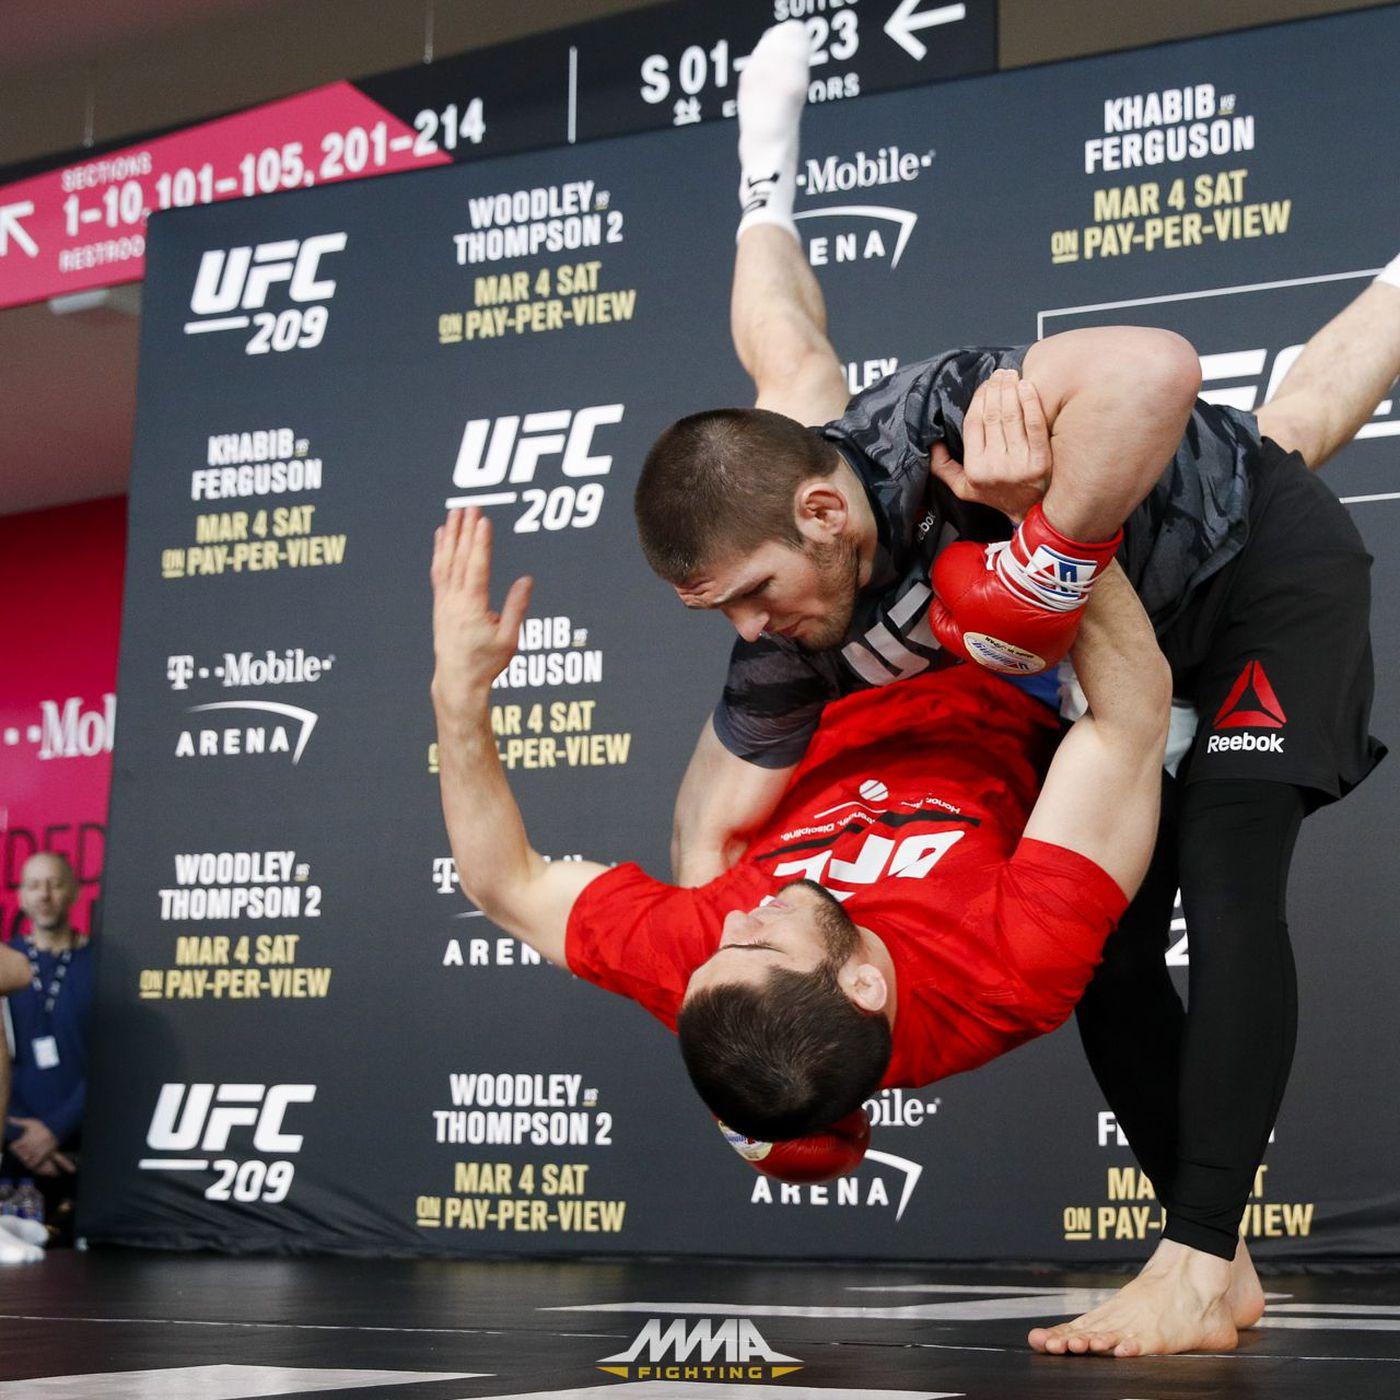 Dana White Khabib Nurmagomedov Vs Justin Gaethje Likely To Headline Abu Dhabi Card After Fight Island Mma Fighting